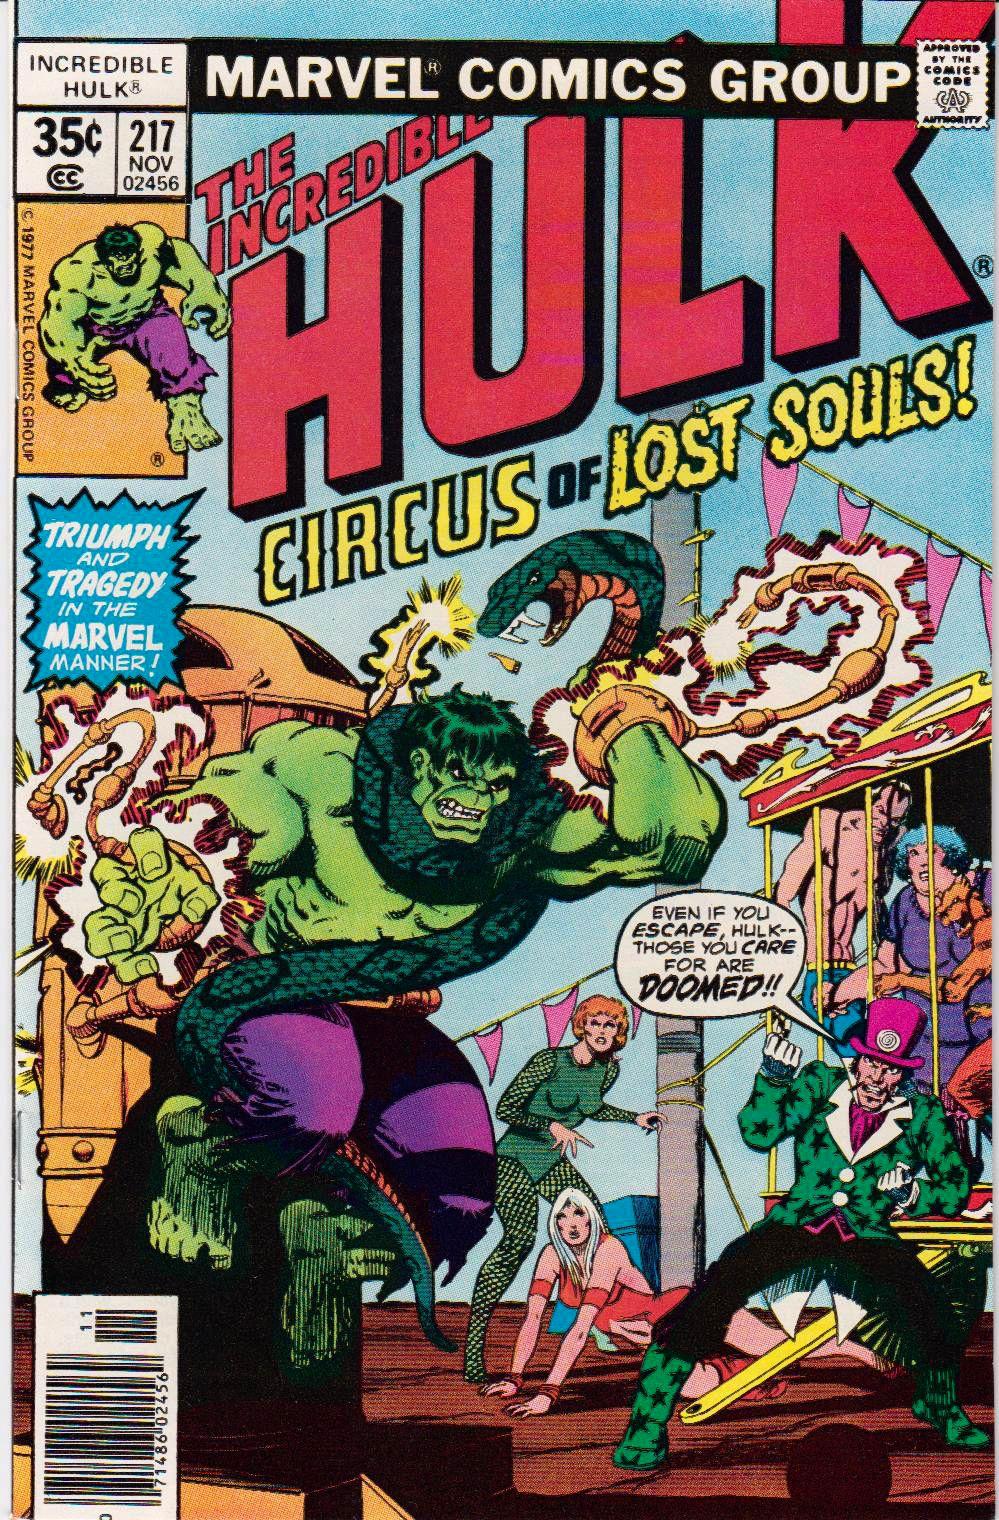 The Incredible Hulk #217